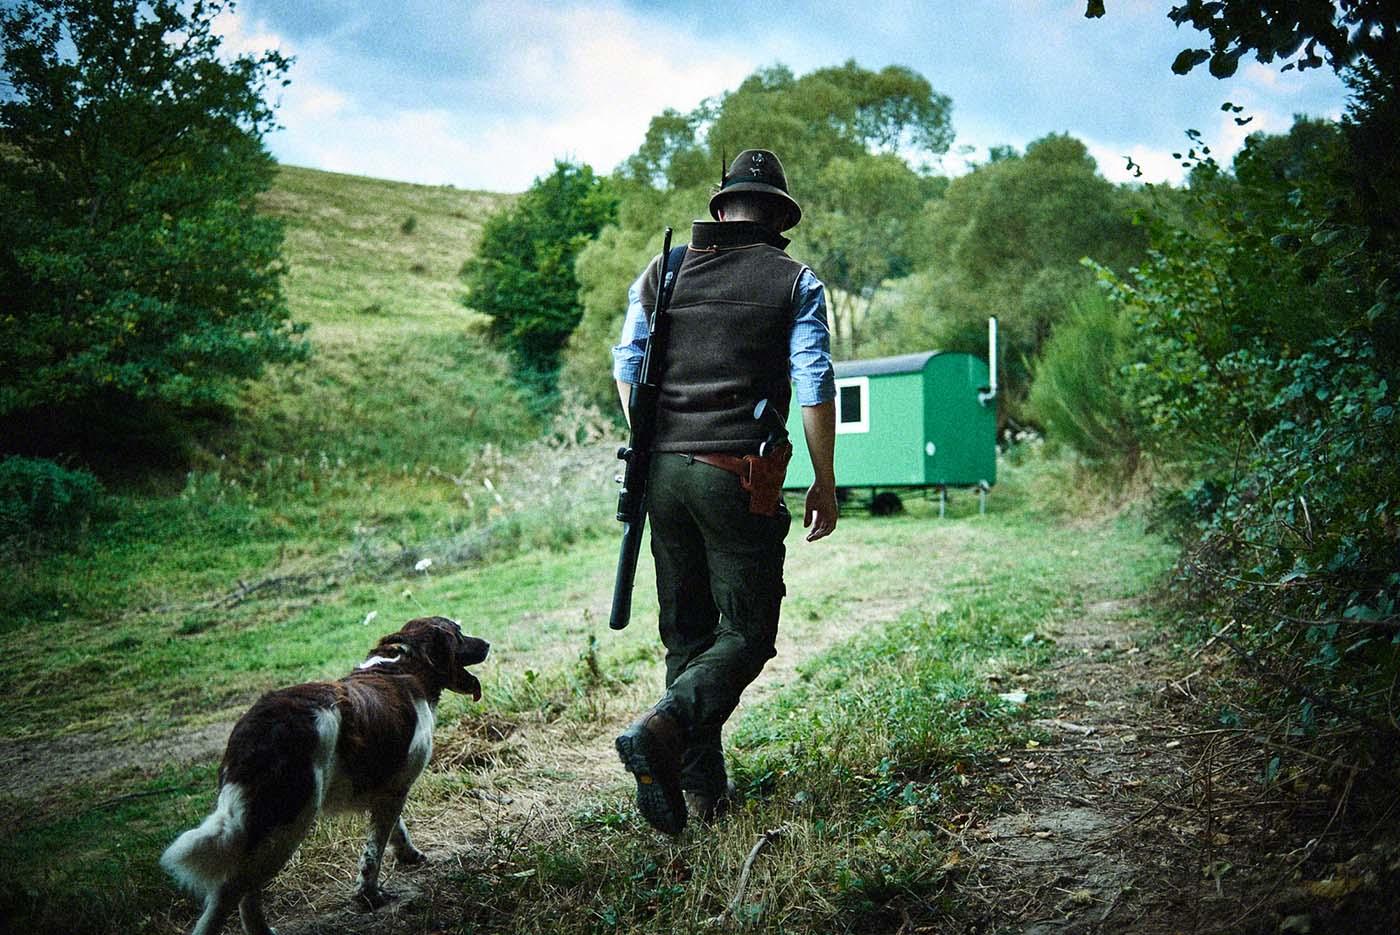 Jäger mit Jagdhund - Jagd-Reportage mit Sternekoch Harald und Maximilian Rüssel Fotos: neon fotografie